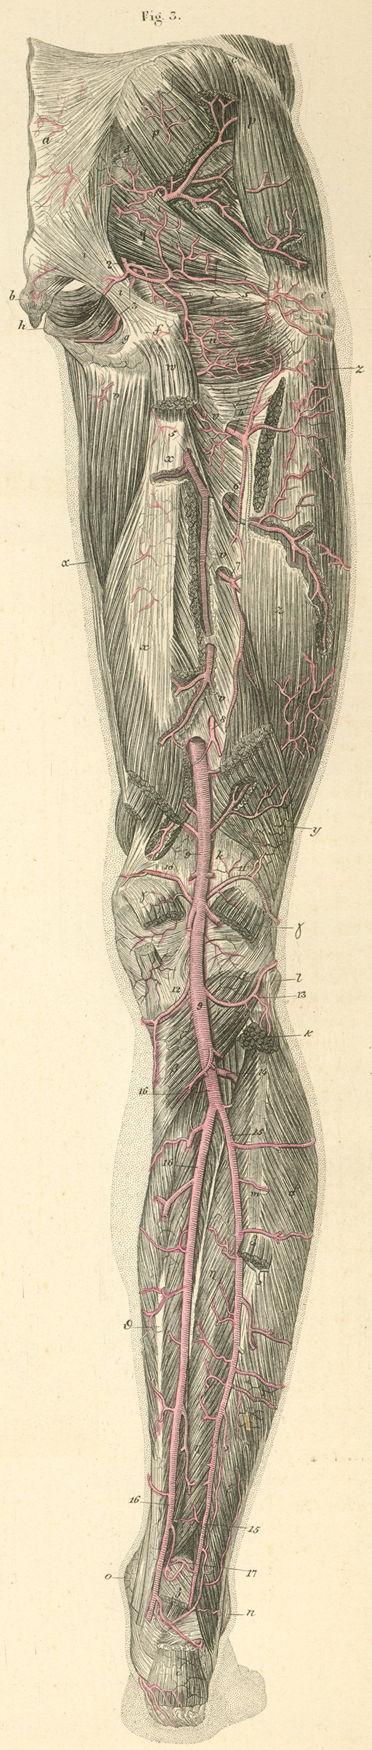 Anatomy Atlases: Atlas of Human Anatomy: Plate 21: Figure 3